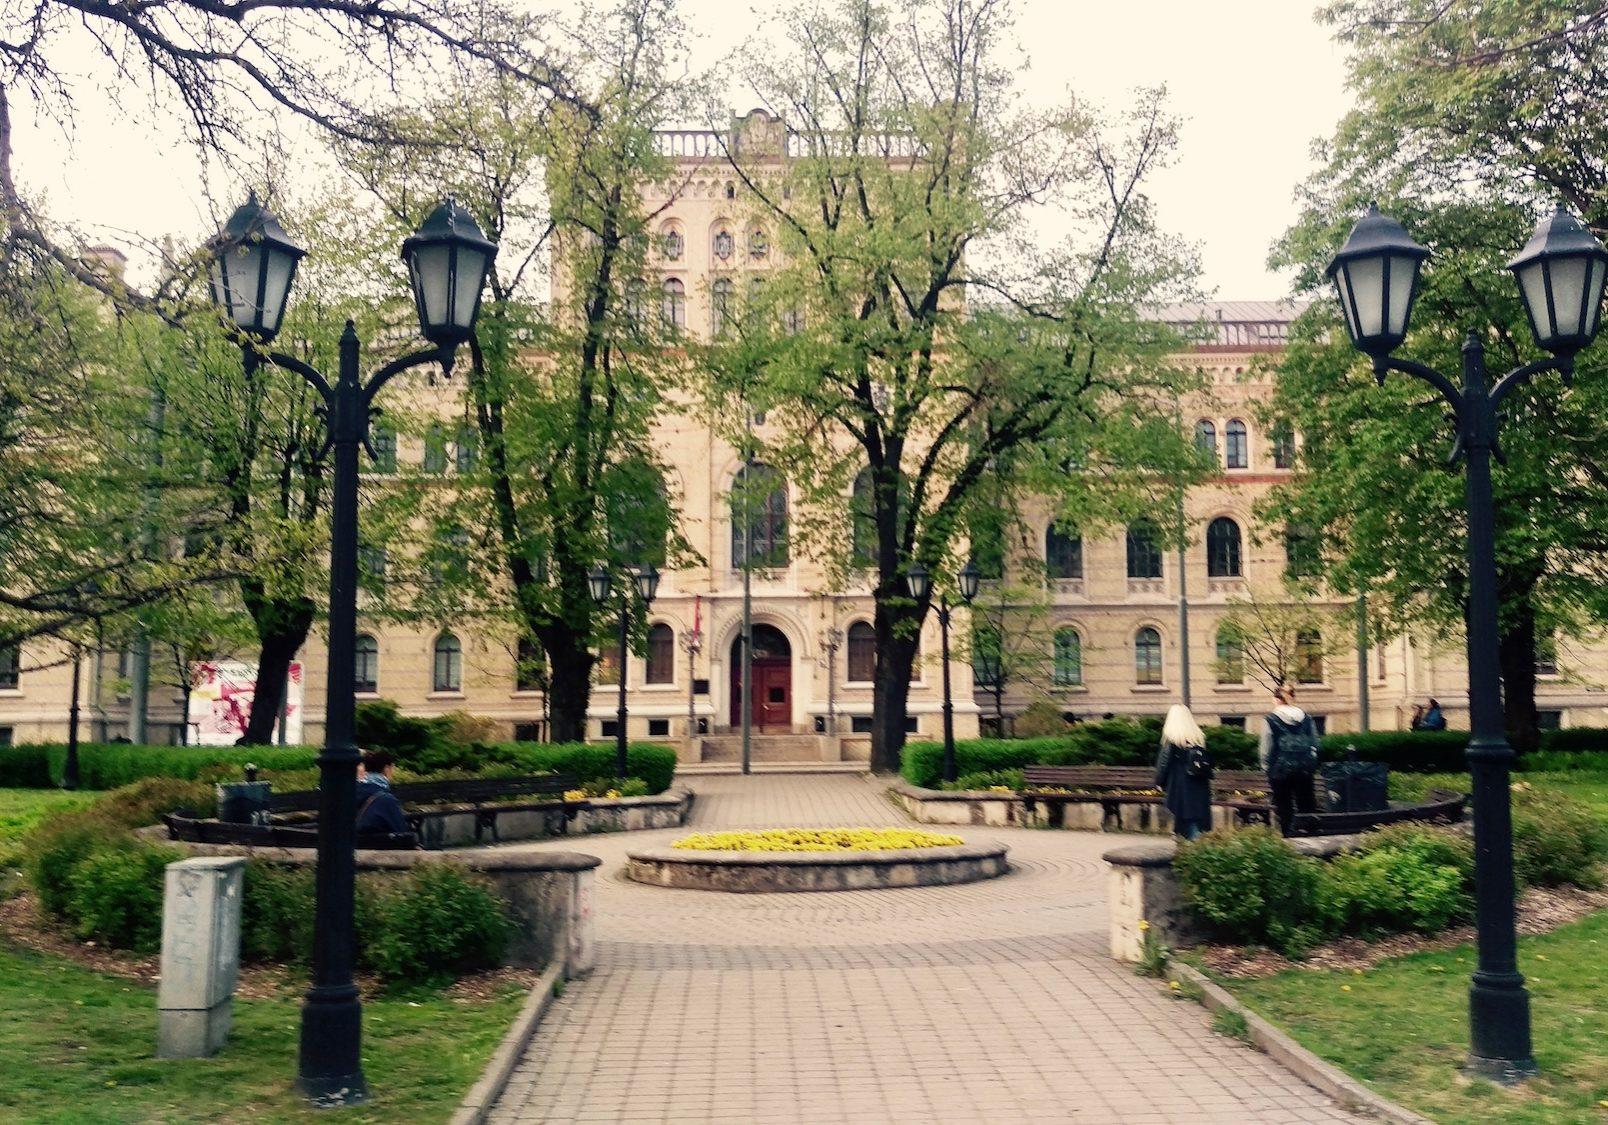 Surrounding territory - University of Latvia